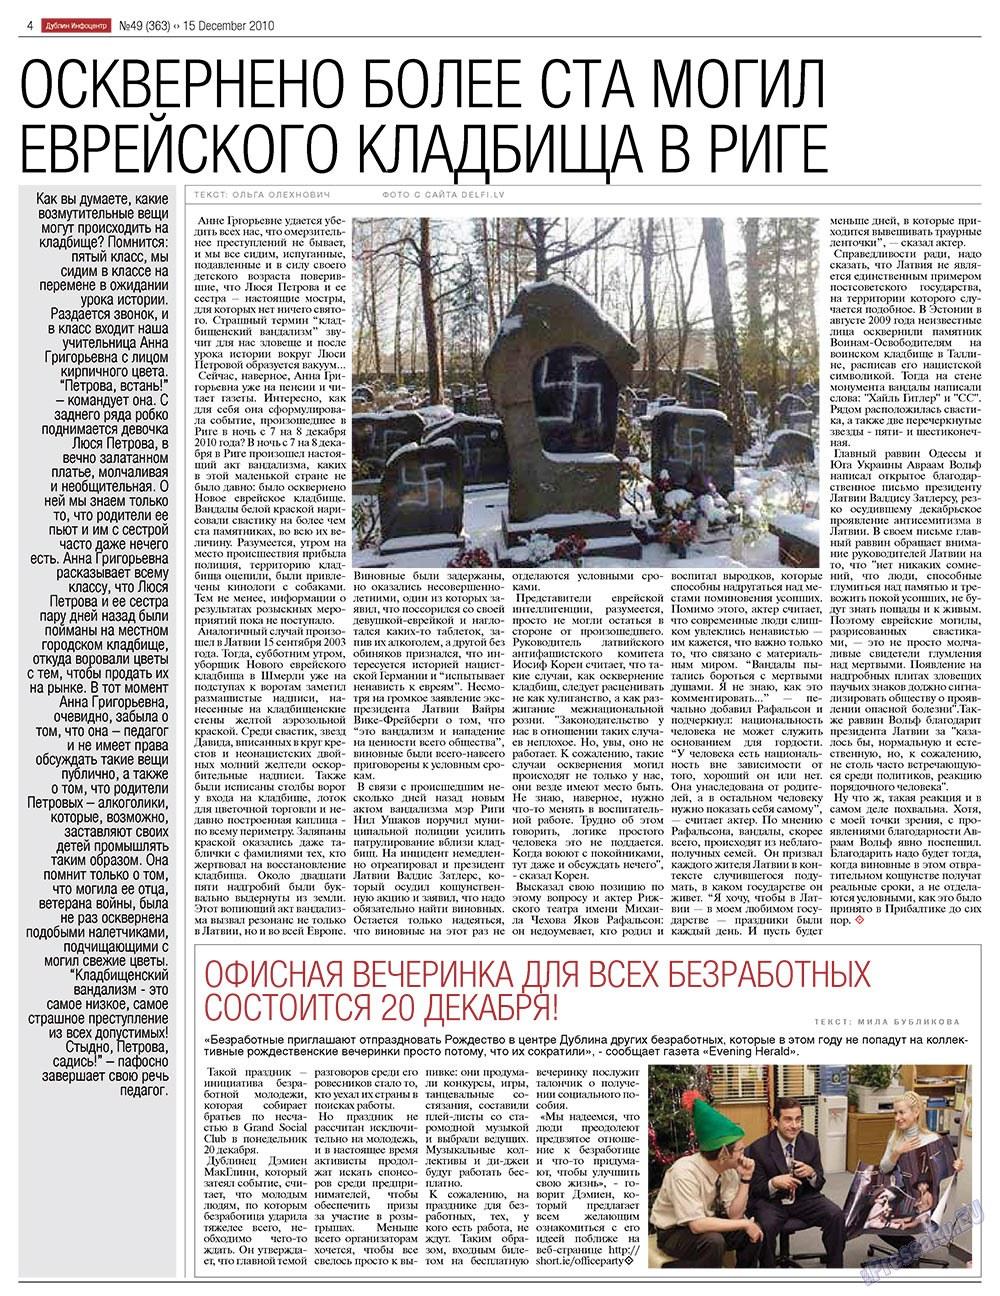 Дублин инфоцентр (газета). 2010 год, номер 49, стр. 4